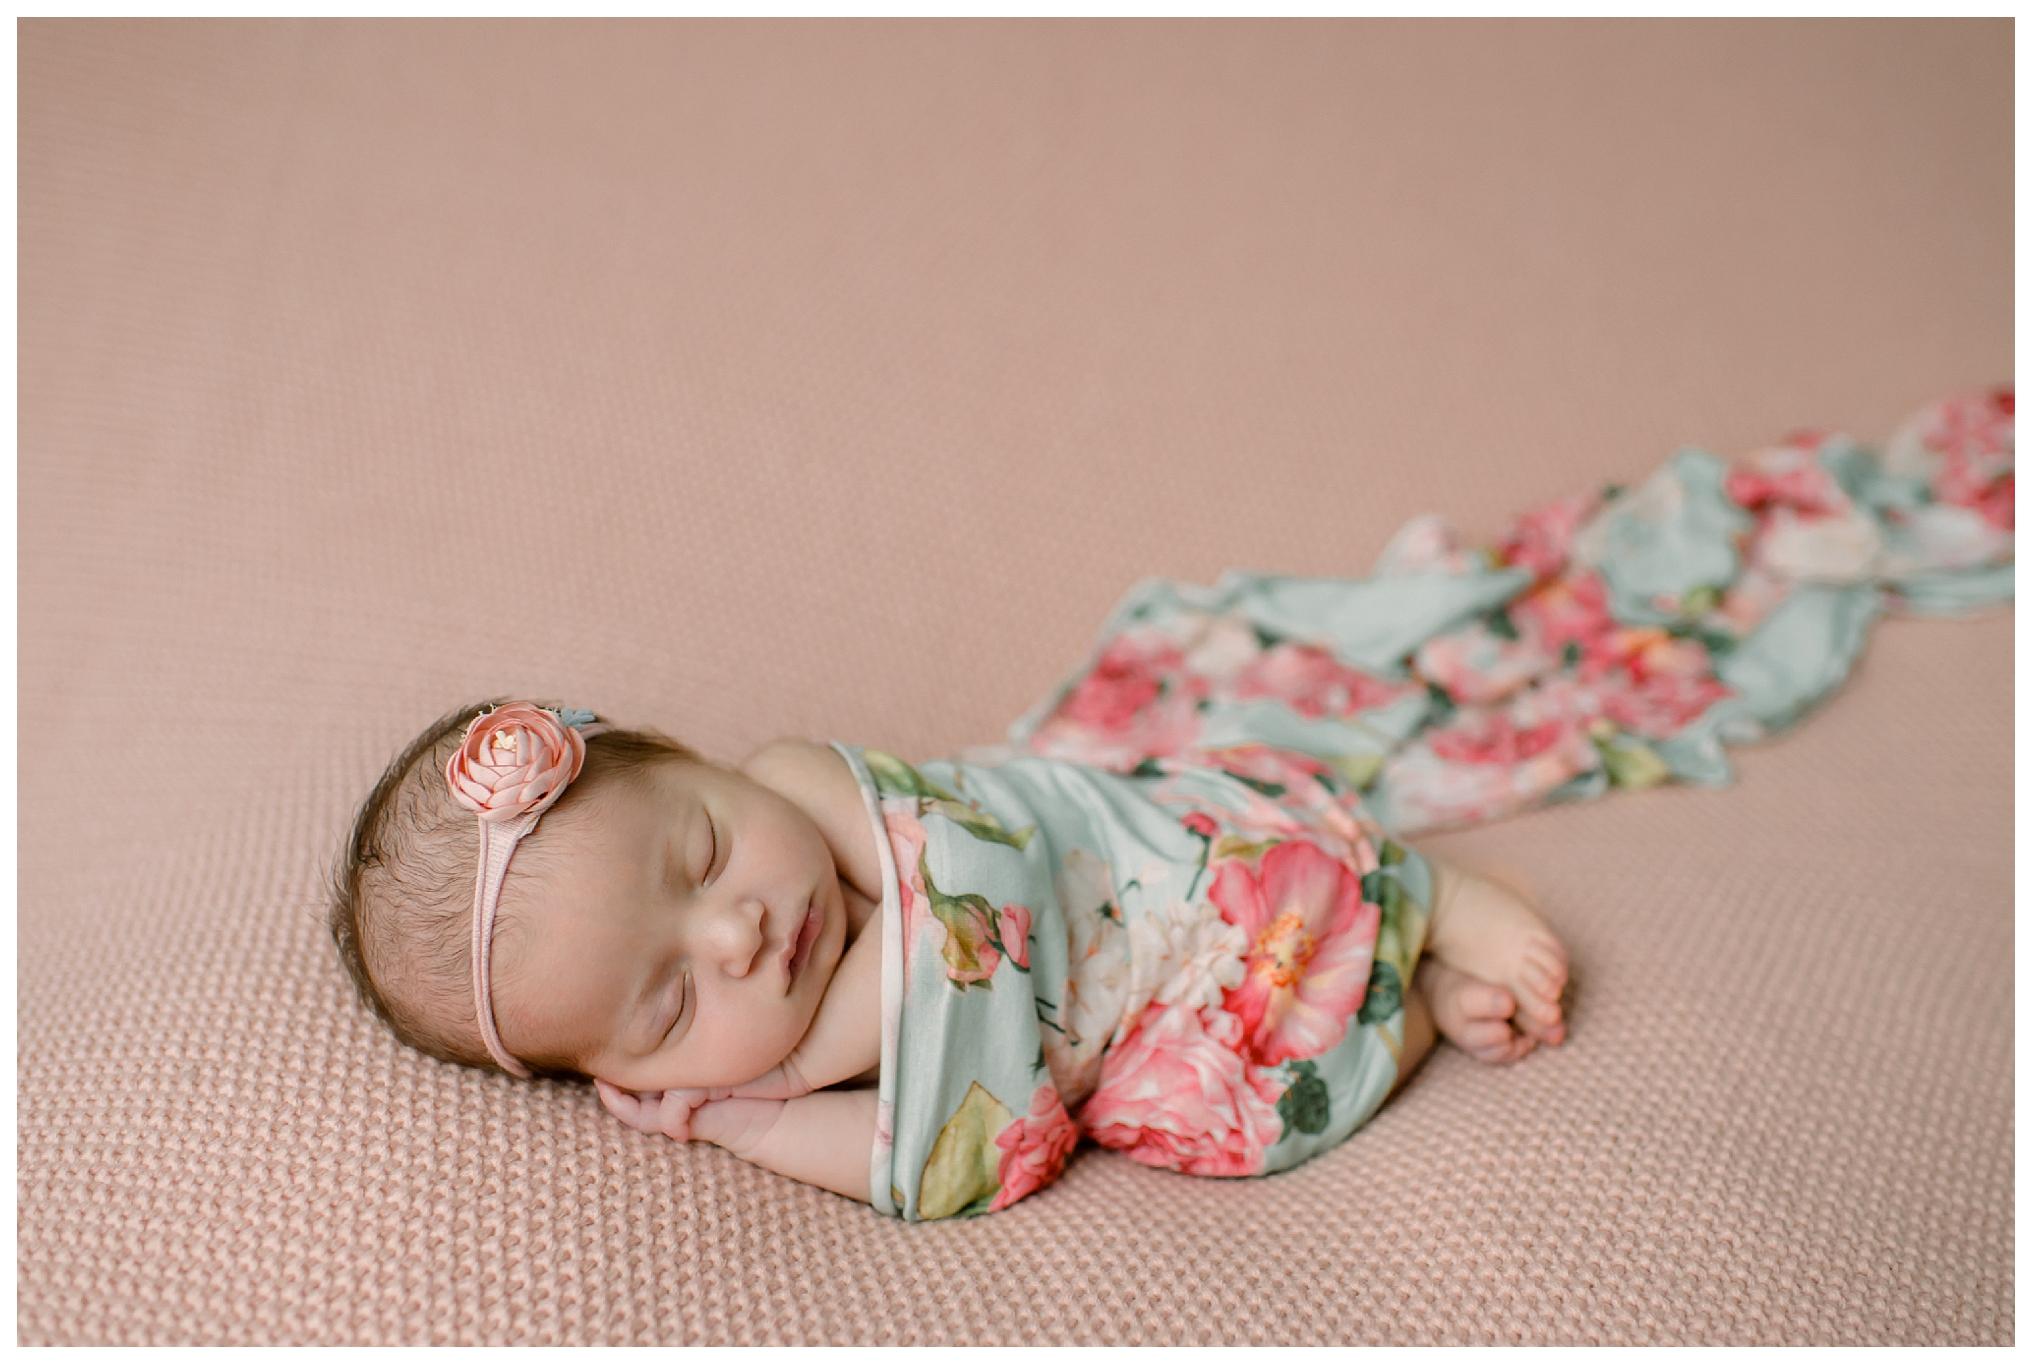 Maine-newborn-photographer-sweet-light-portraits256.jpg